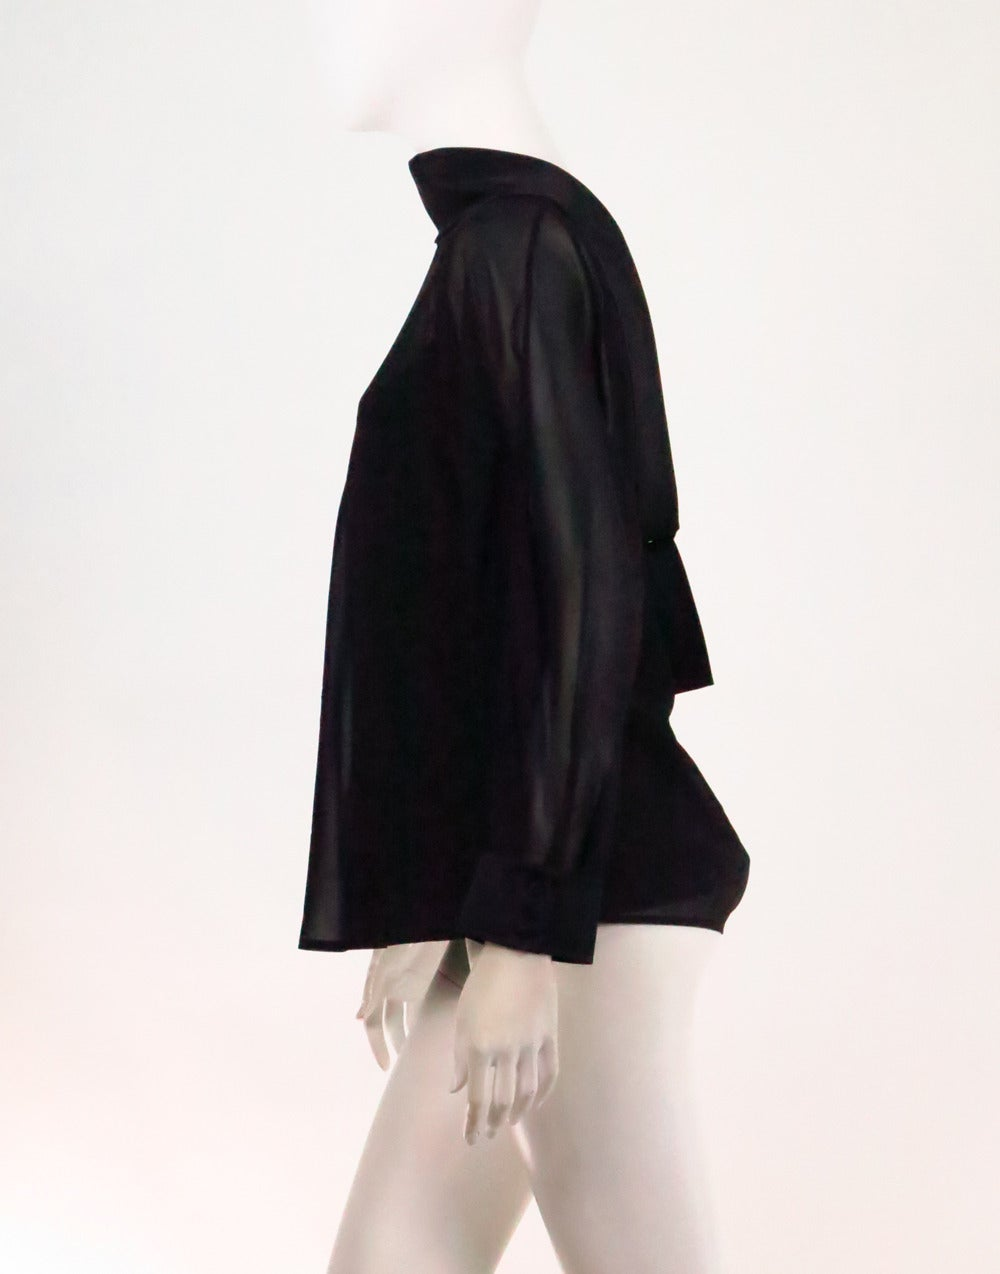 St John Black Silk Chiffon Evening Blouse NWT 10 At 1stdibs